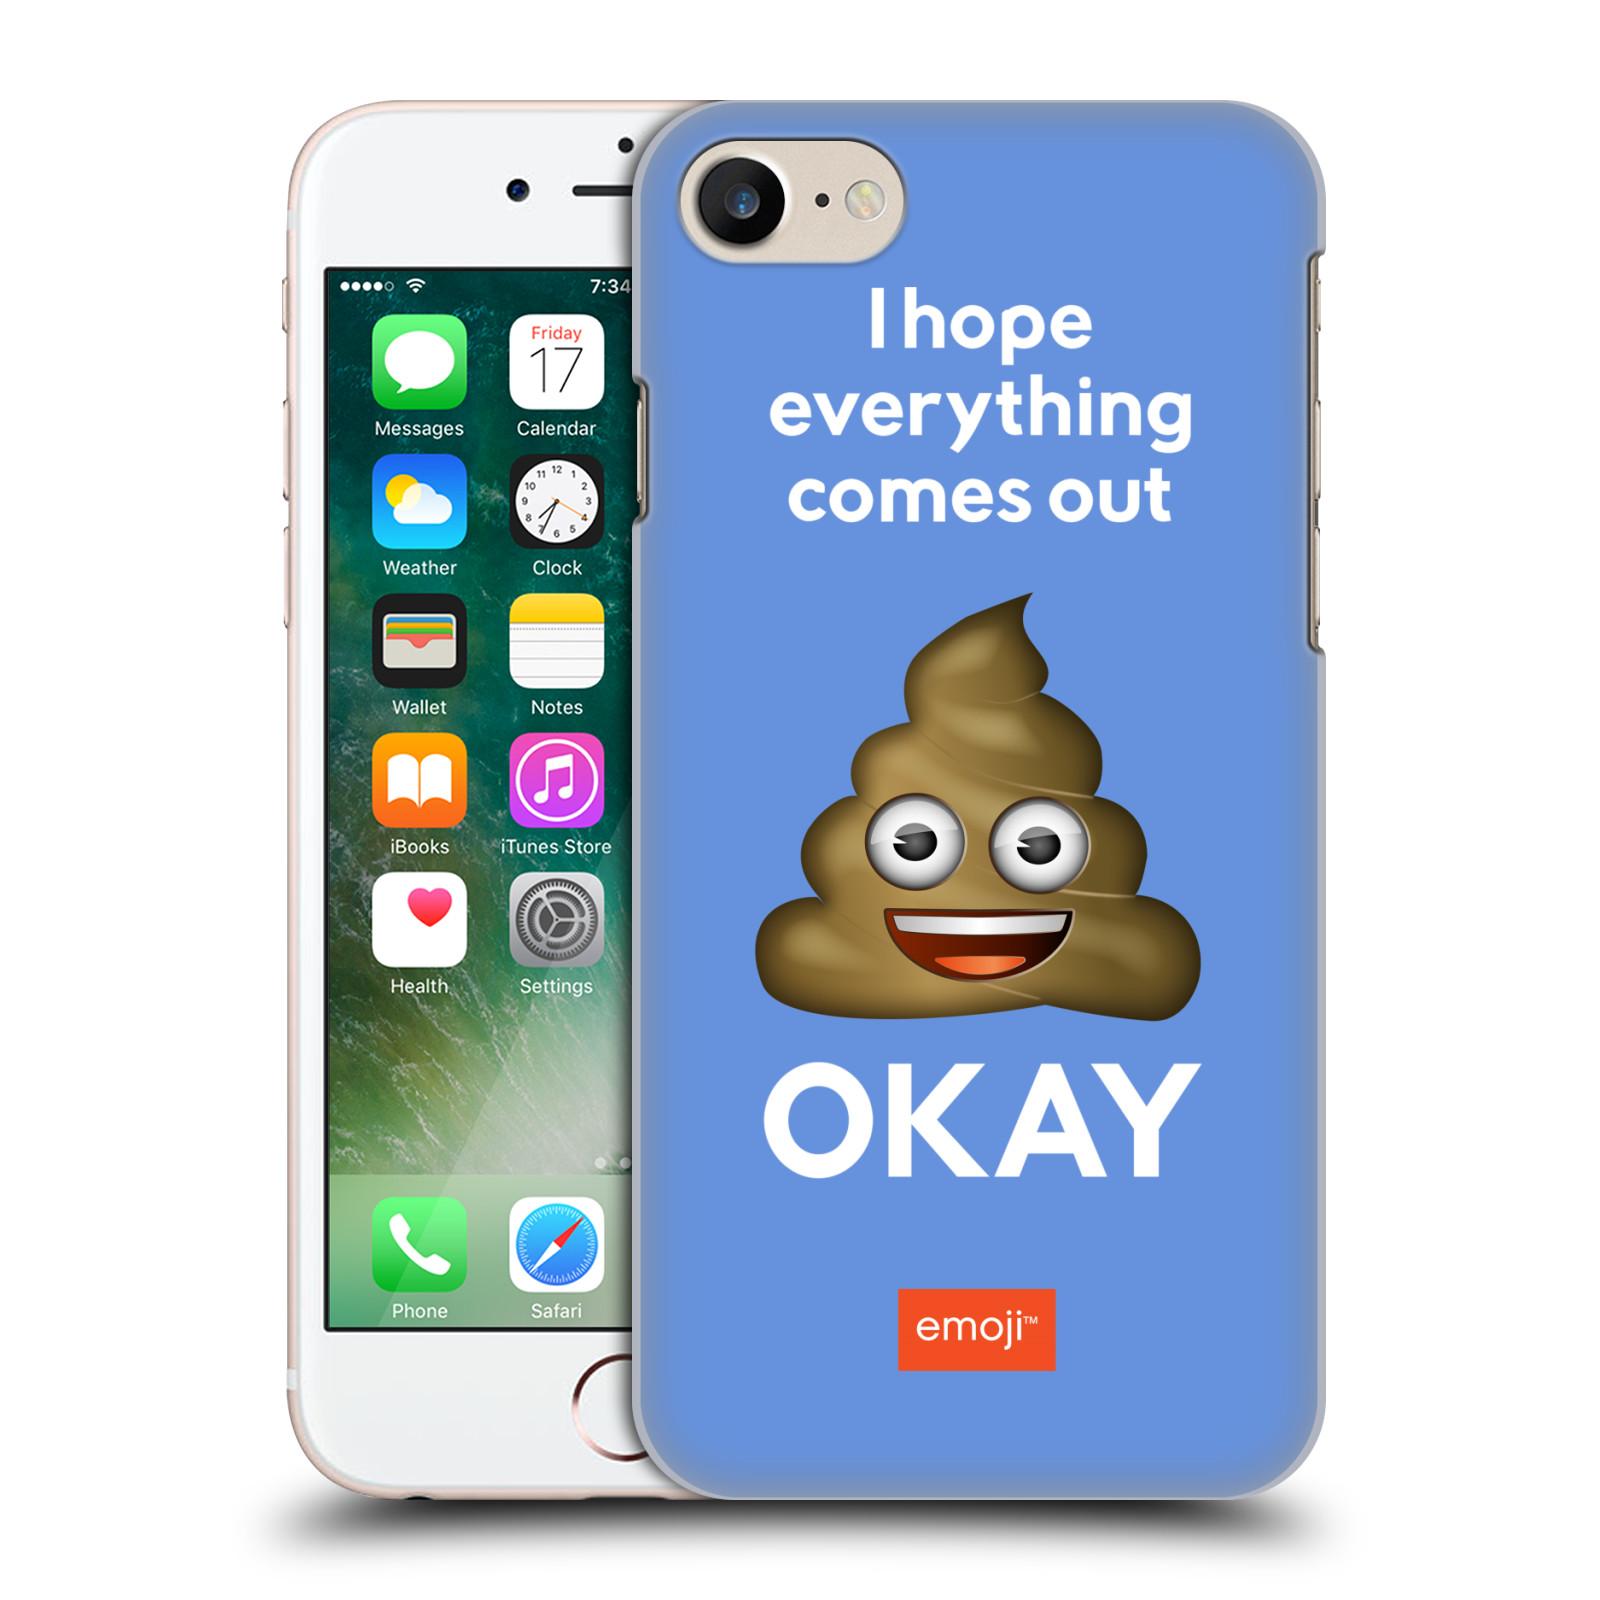 Plastové pouzdro na mobil Apple iPhone 7 HEAD CASE EMOJI - Hovínko OKAY